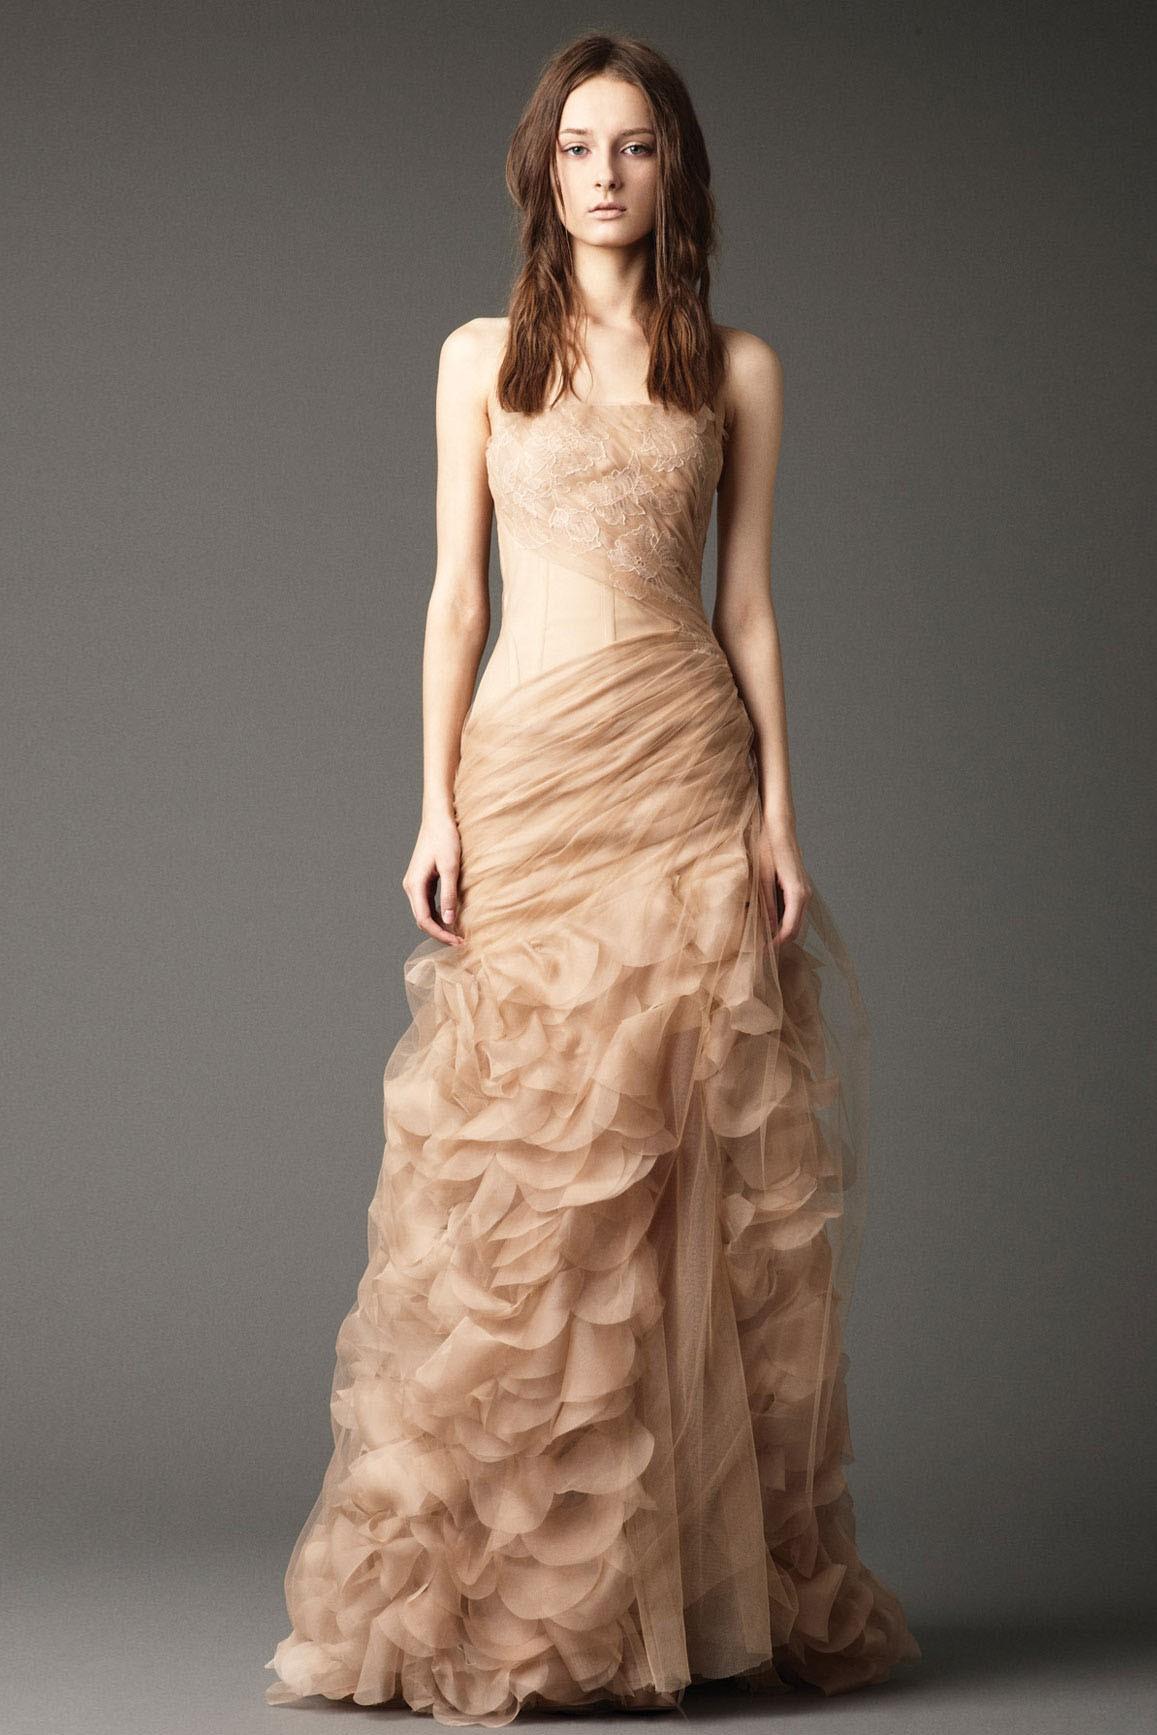 Champagne Colored Dresses Dressedupgirl Com